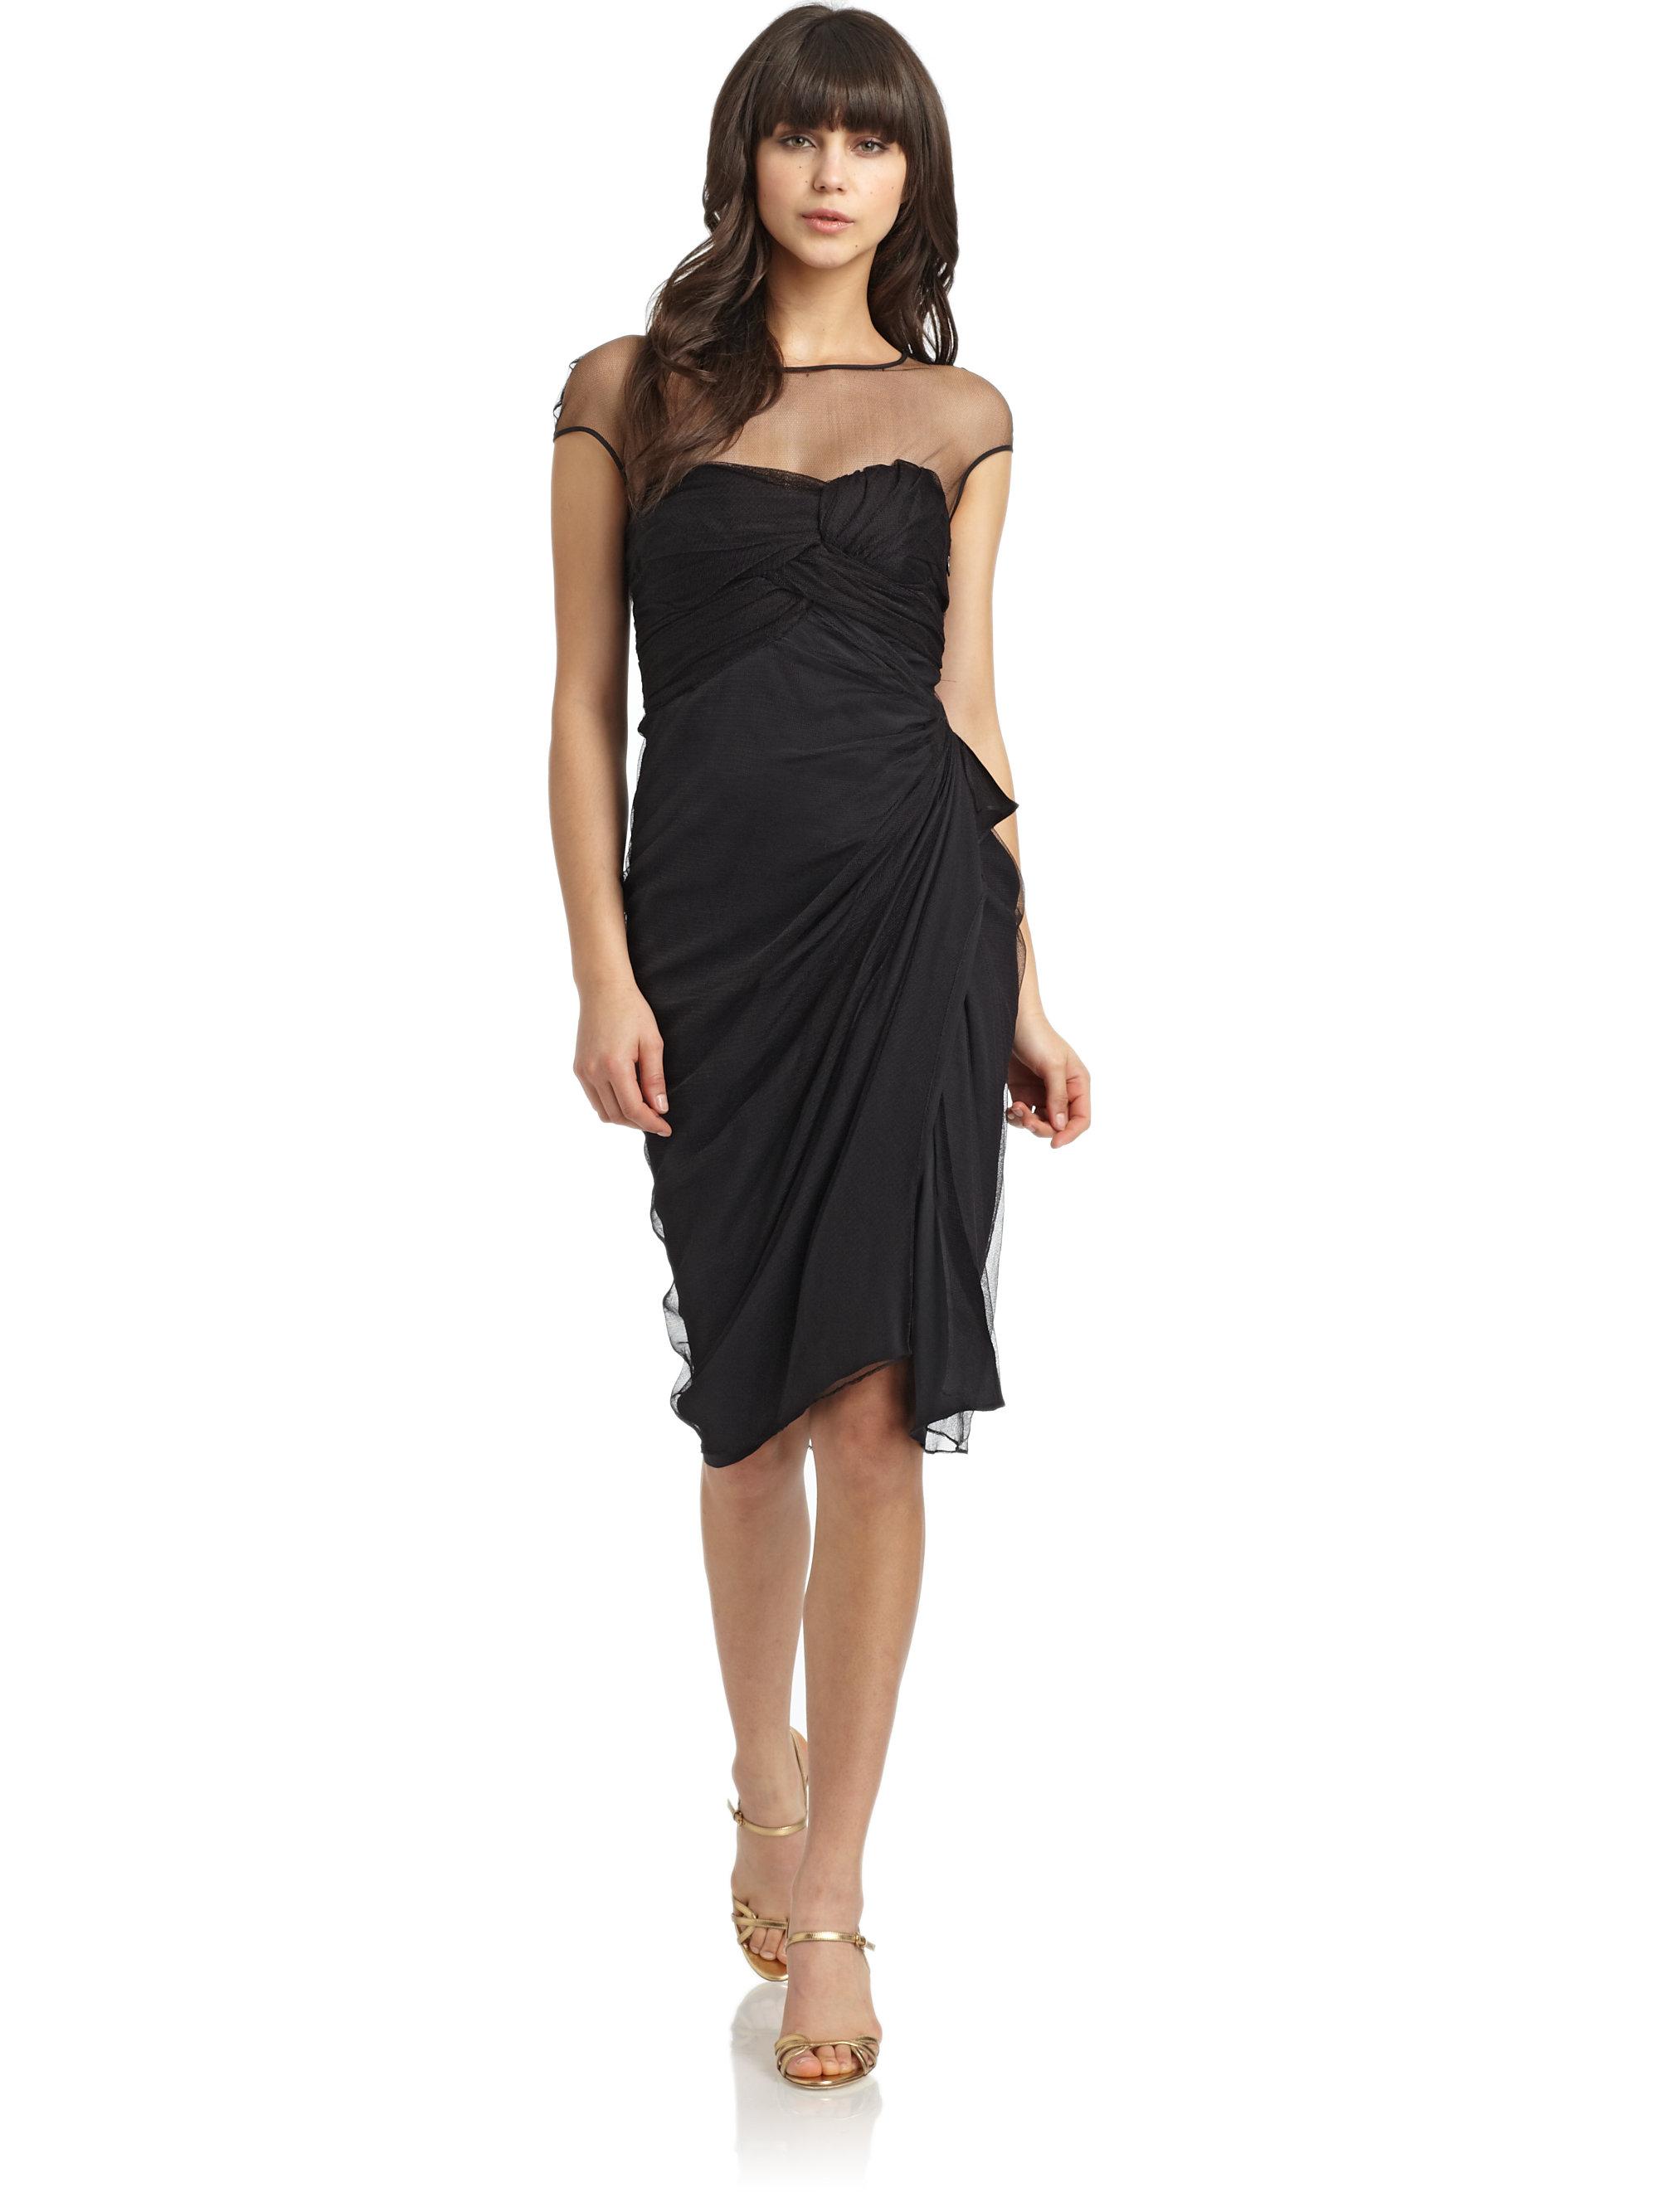 Black Silk Cocktail Dresses